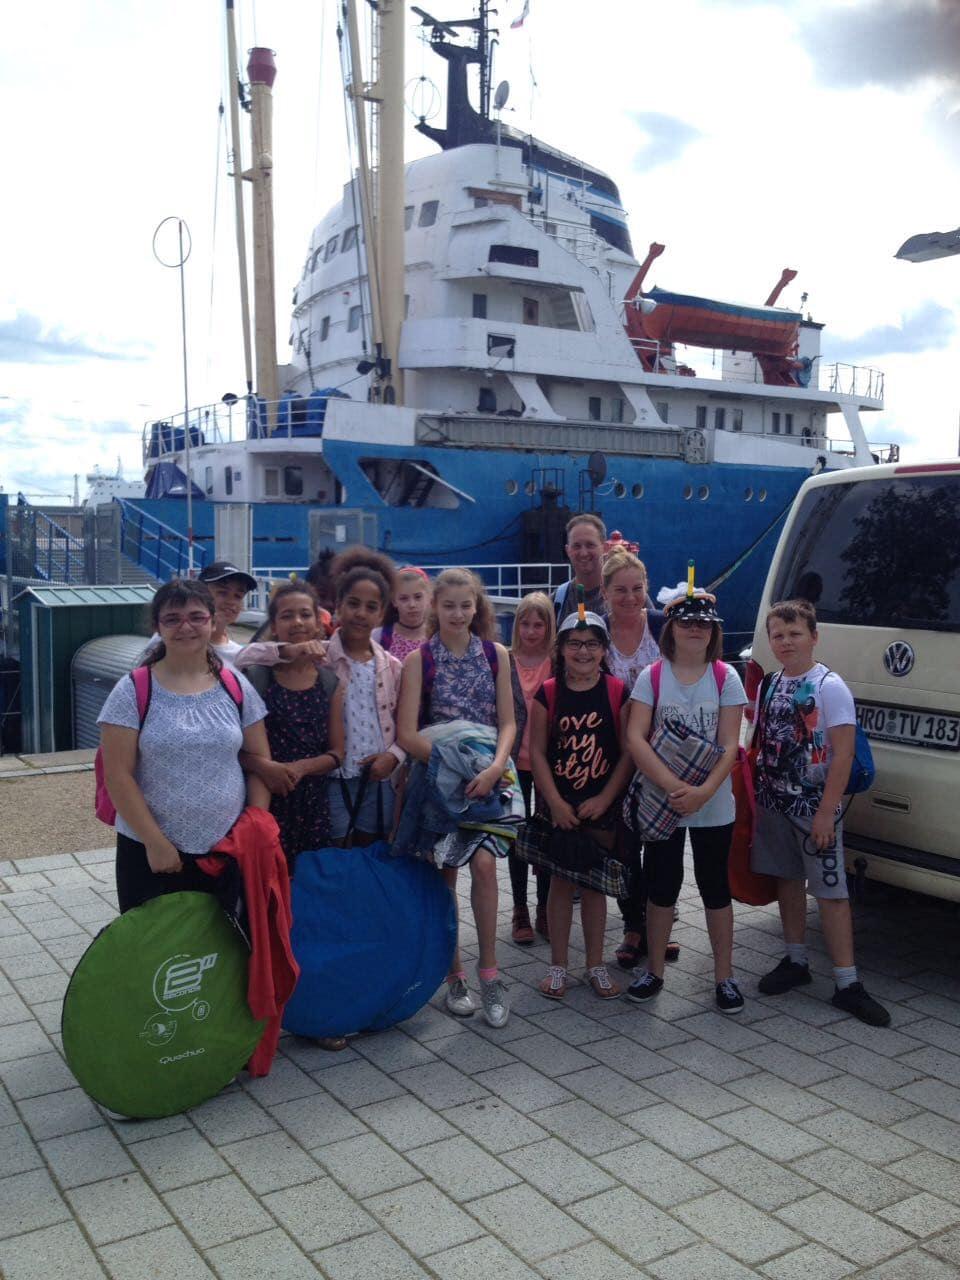 Taxi Rostock – Kinder von der Likedeeler